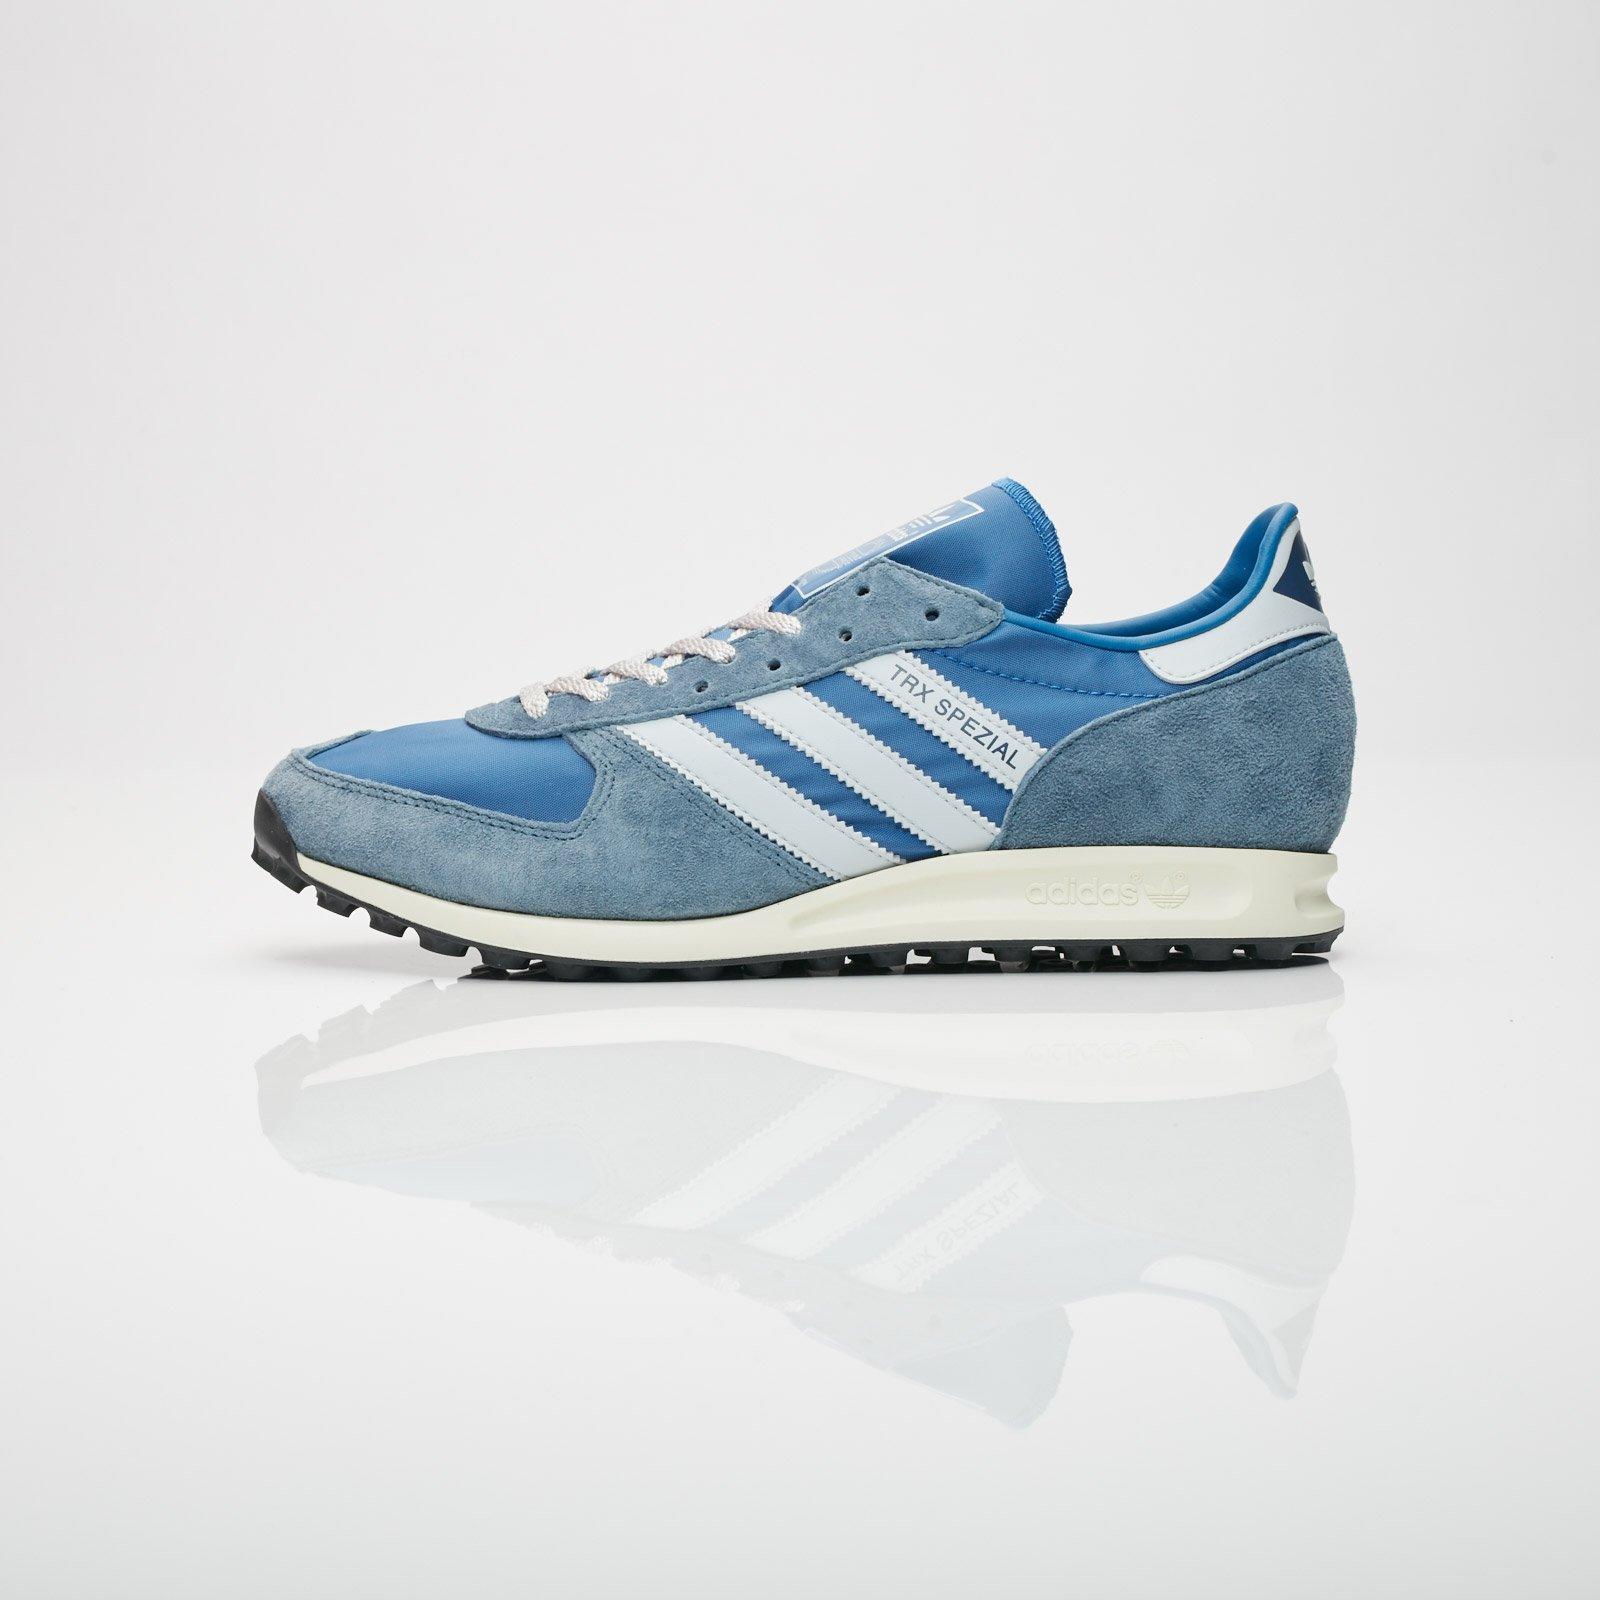 adidas TRX - Cg2924 - Sneakersnstuff